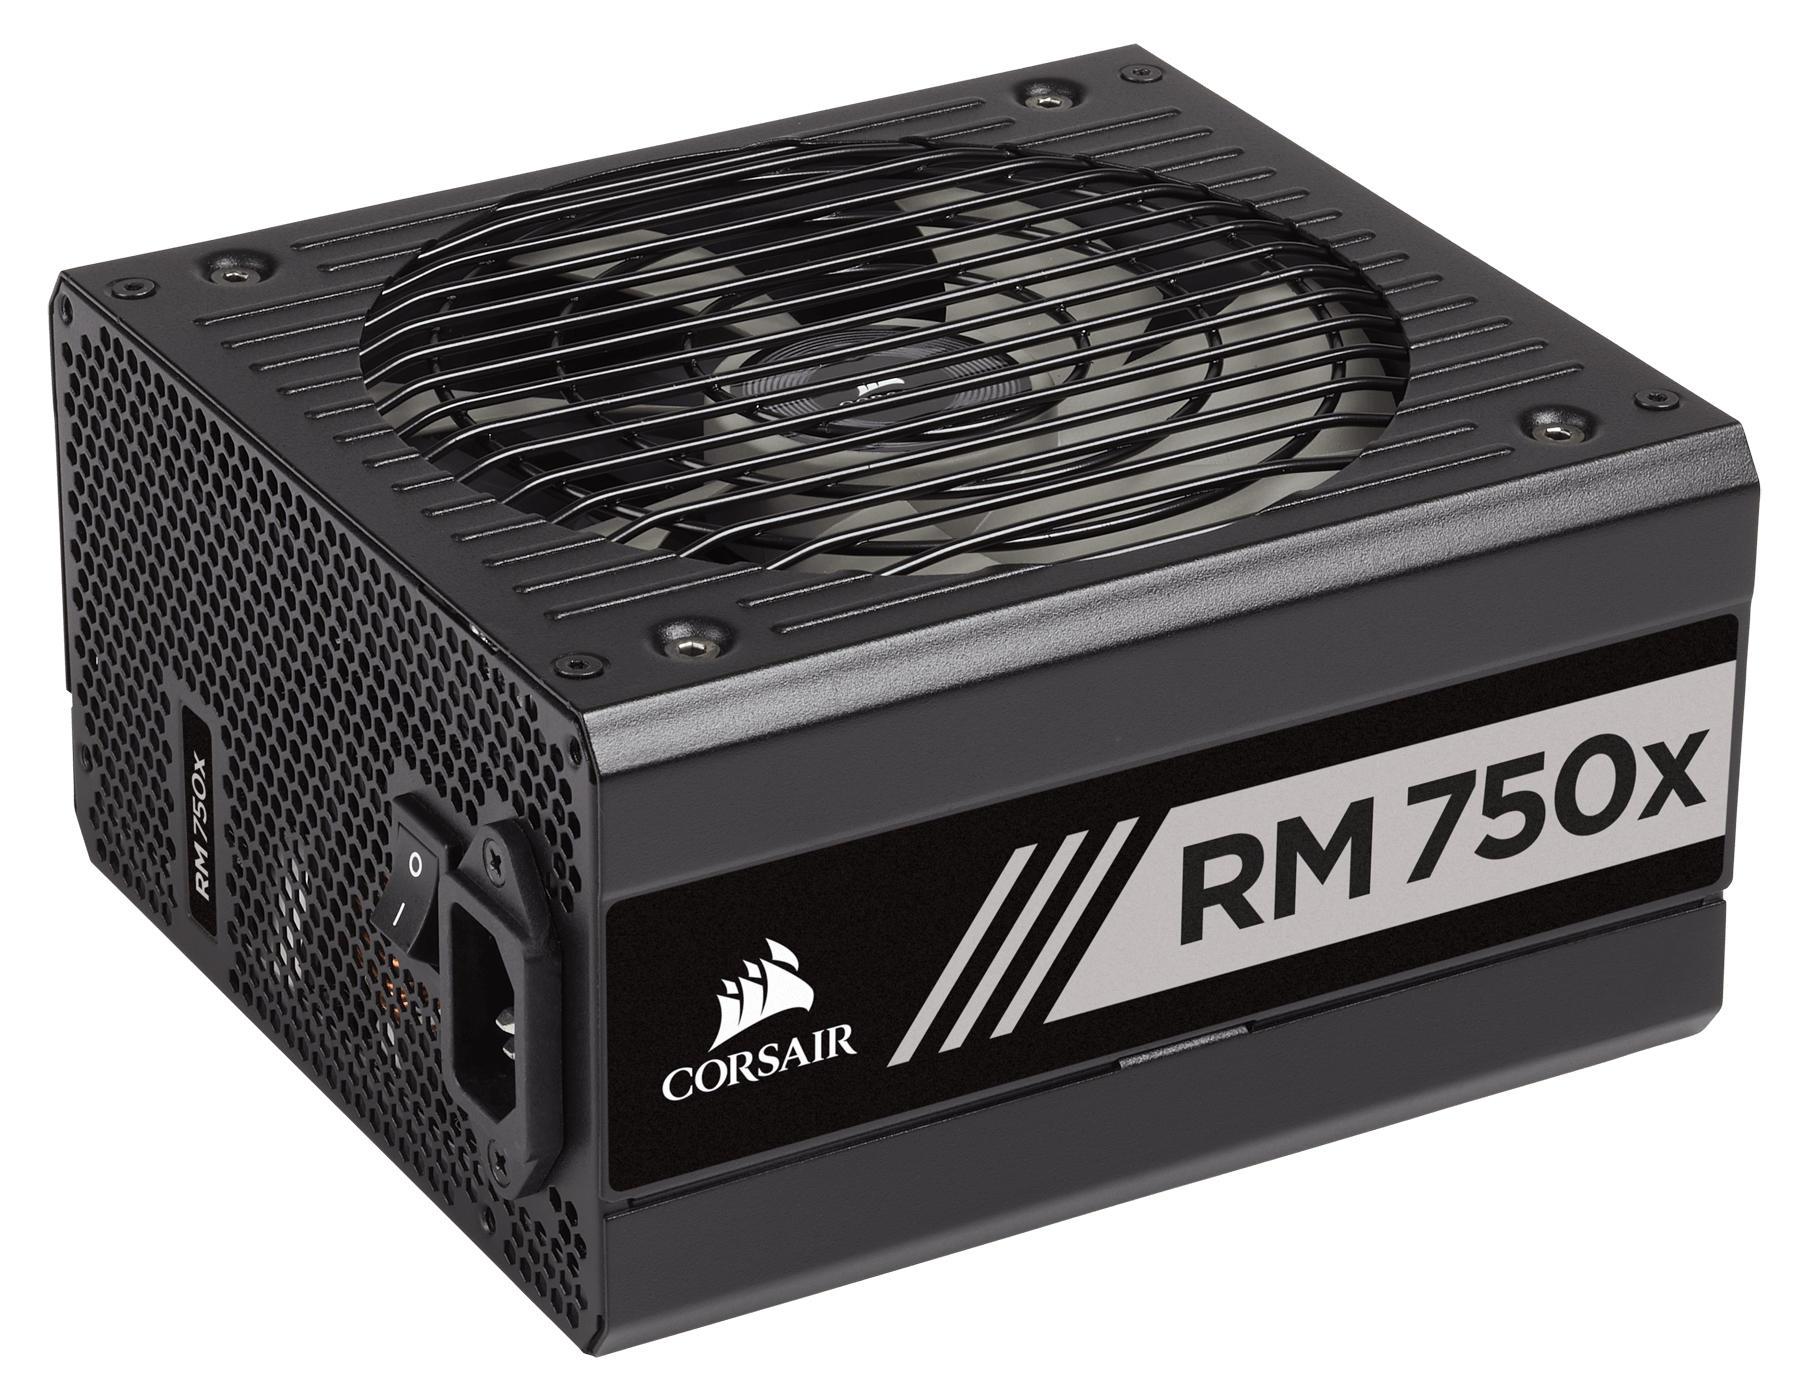 Corsair RM750x voeding